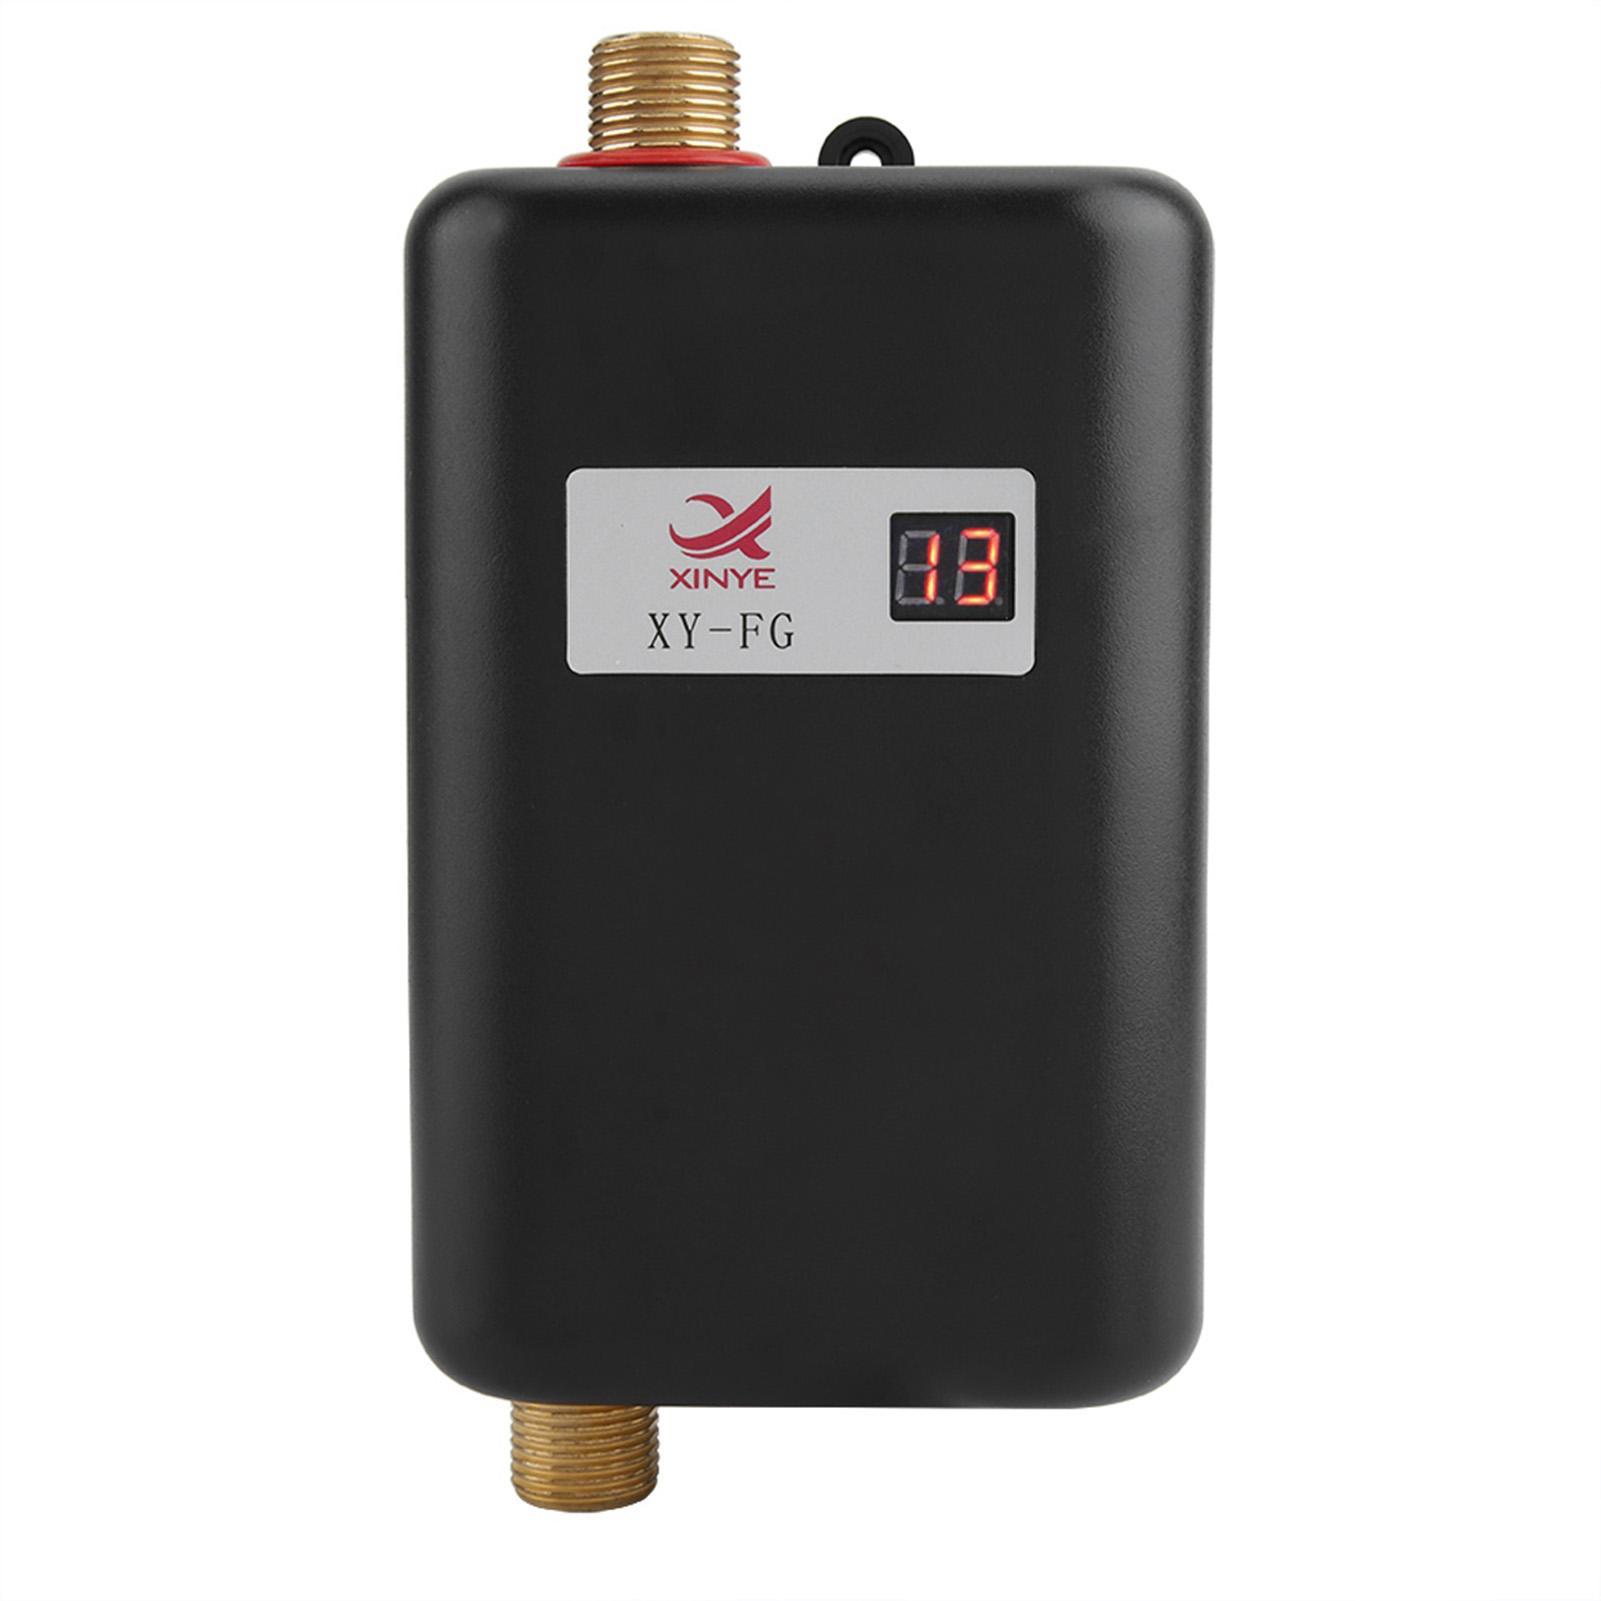 3400w 220v mini elektronisch durchlauferhitzer set tankless k che warmwasser ebay. Black Bedroom Furniture Sets. Home Design Ideas